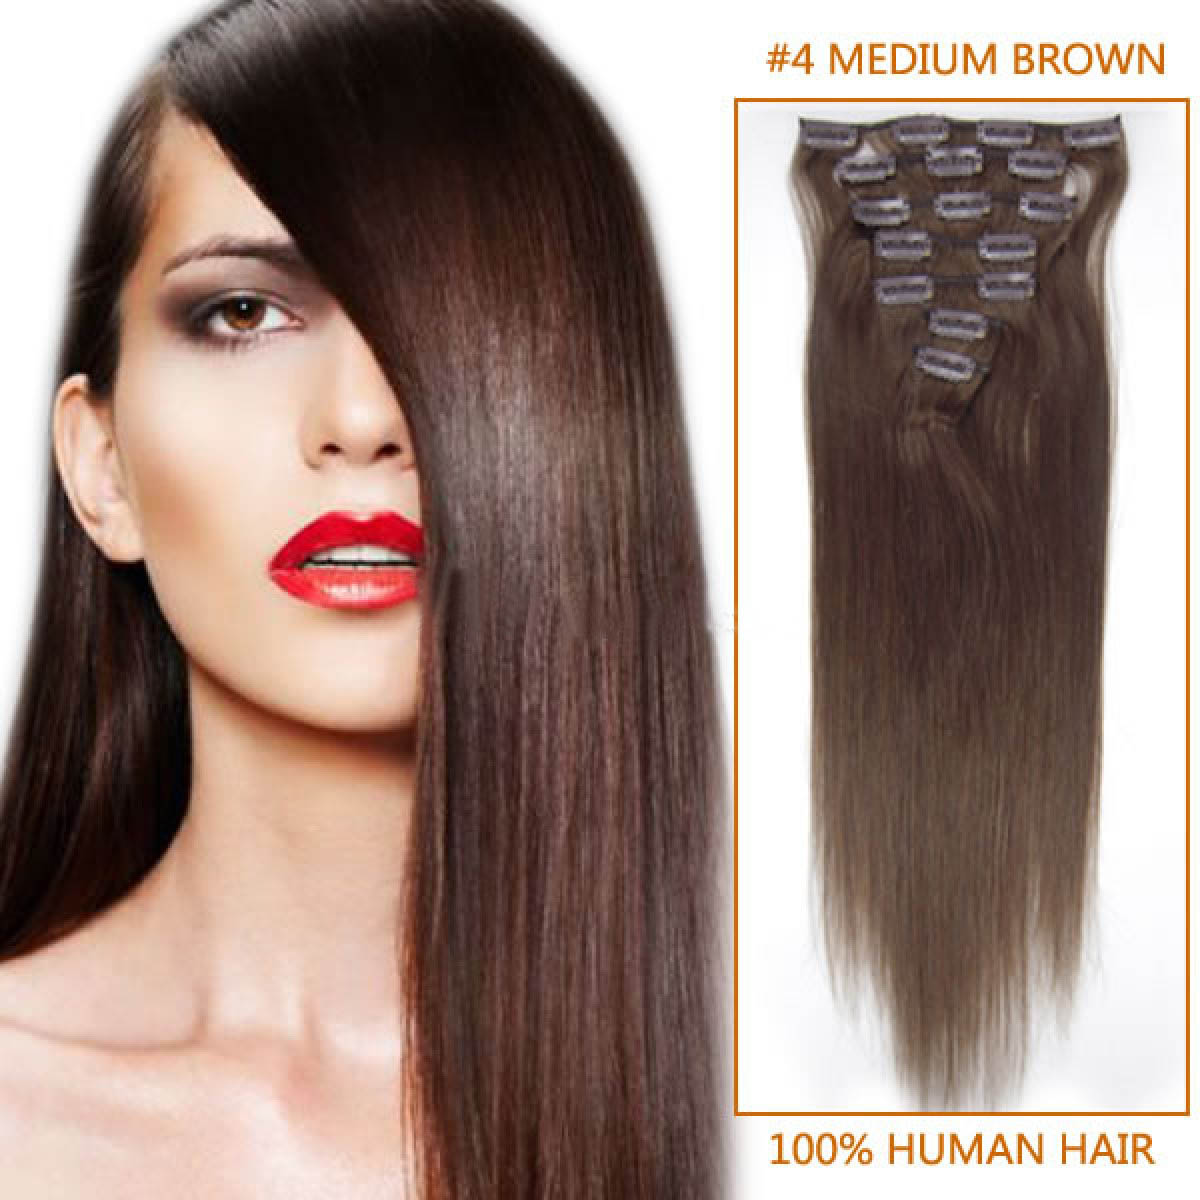 Inch 4 medium brown clip in remy human hair extensions 7pcs 24 inch 4 medium brown clip in remy human hair extensions 7pcs pmusecretfo Gallery